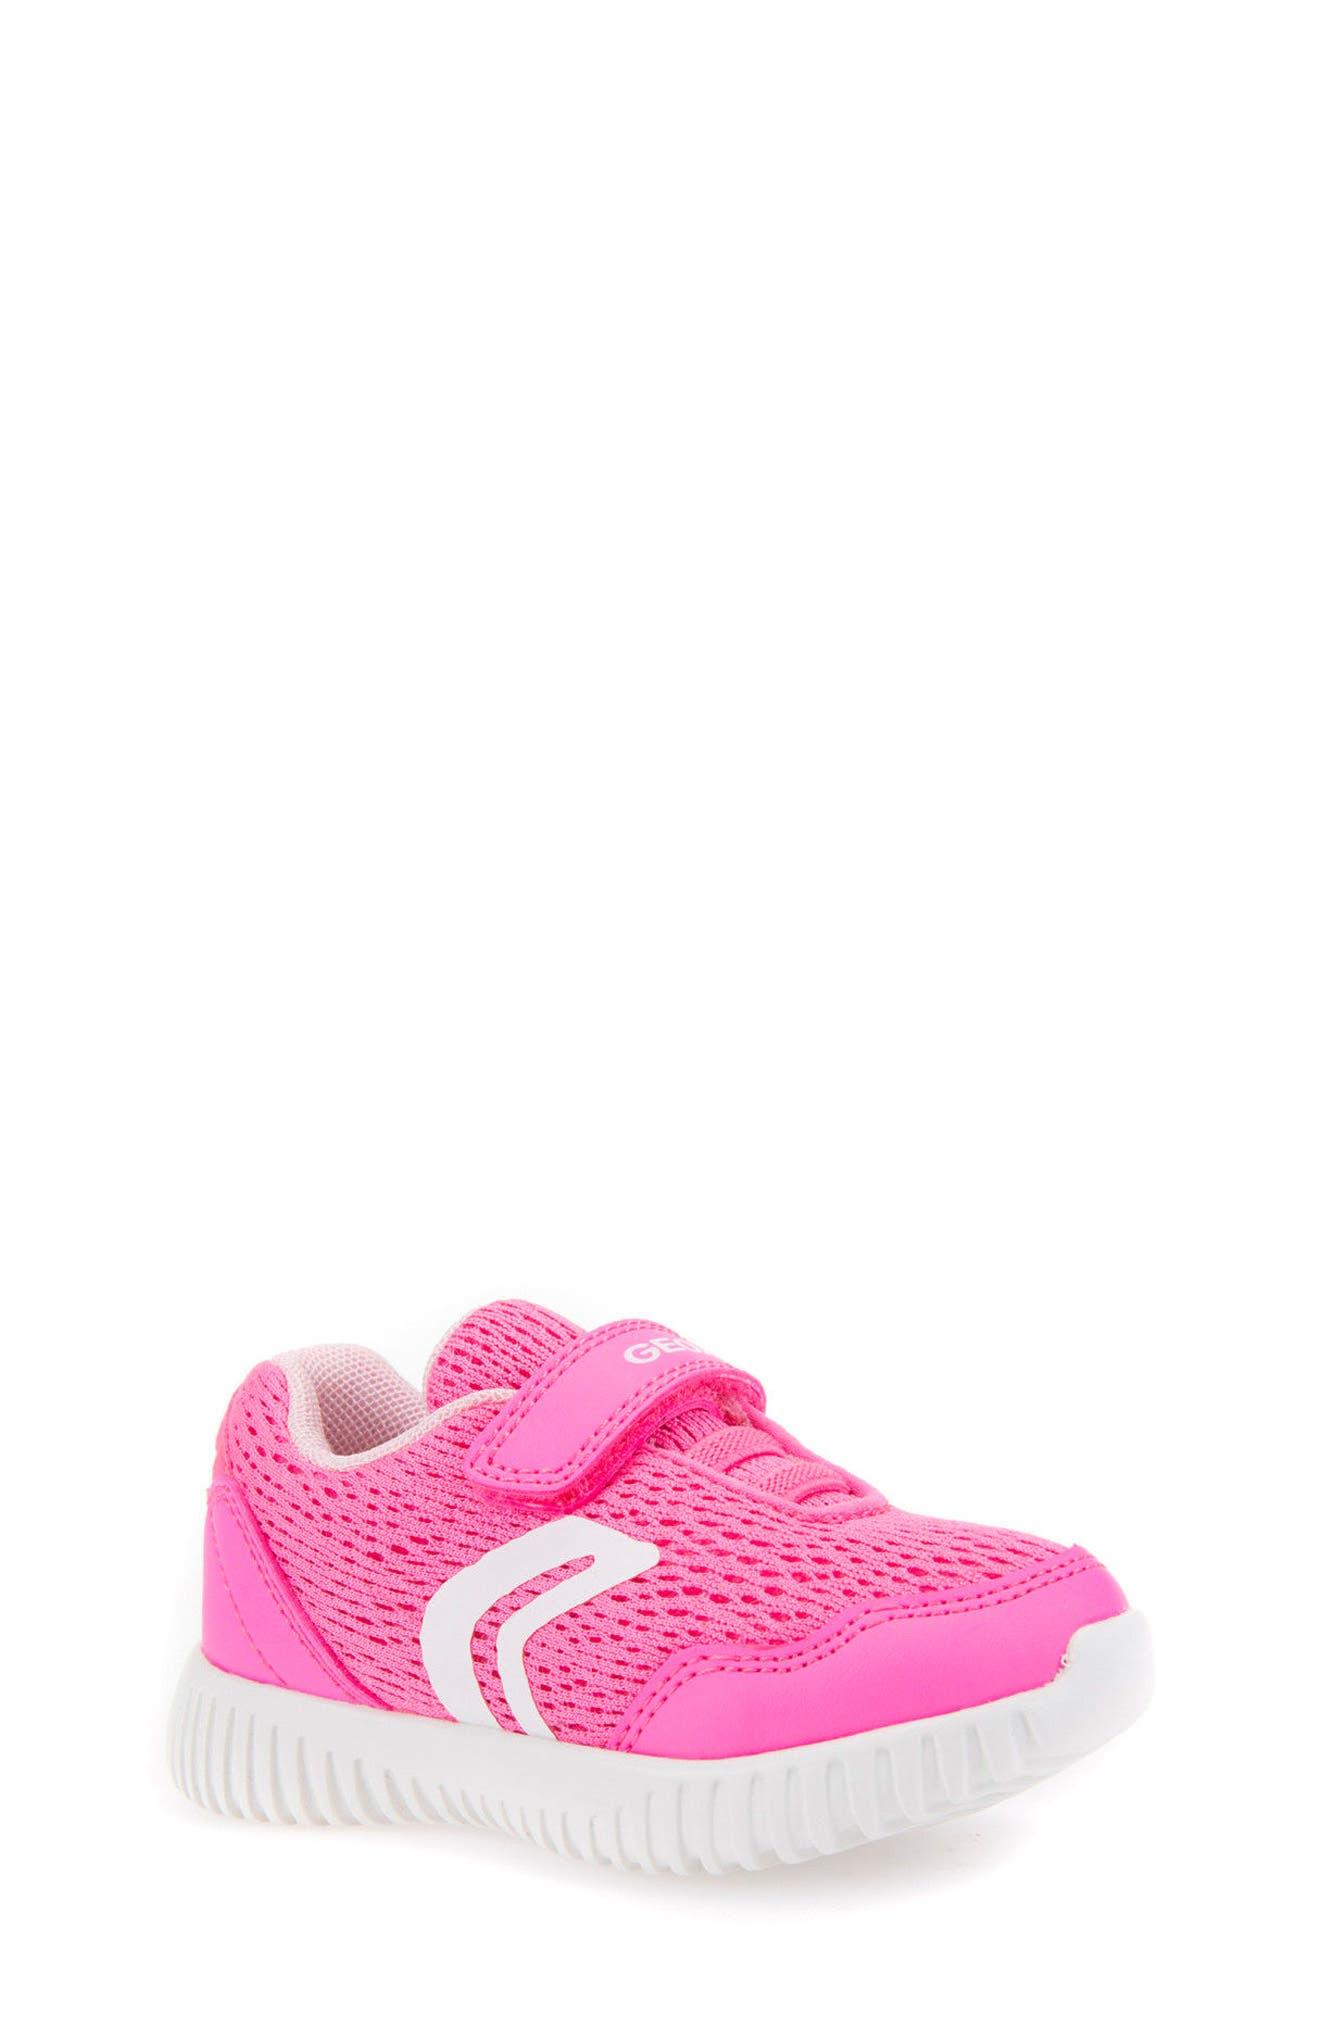 Waviness Sneaker,                             Main thumbnail 1, color,                             Fluorescent Fuchsia